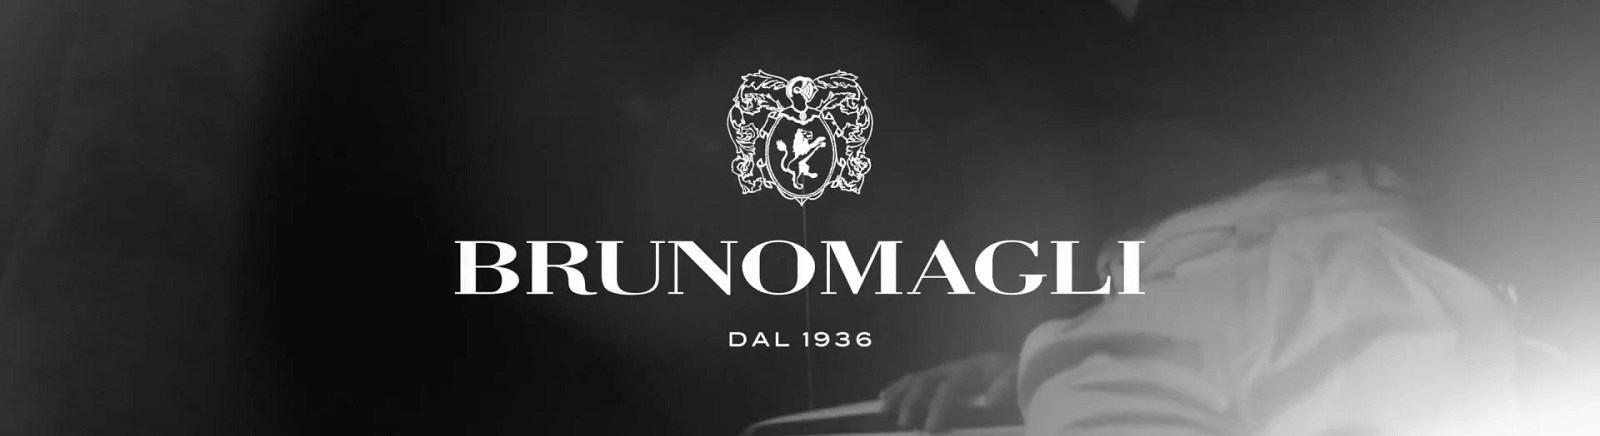 Prange: Bruno Magli Herrenschuhe online shoppen